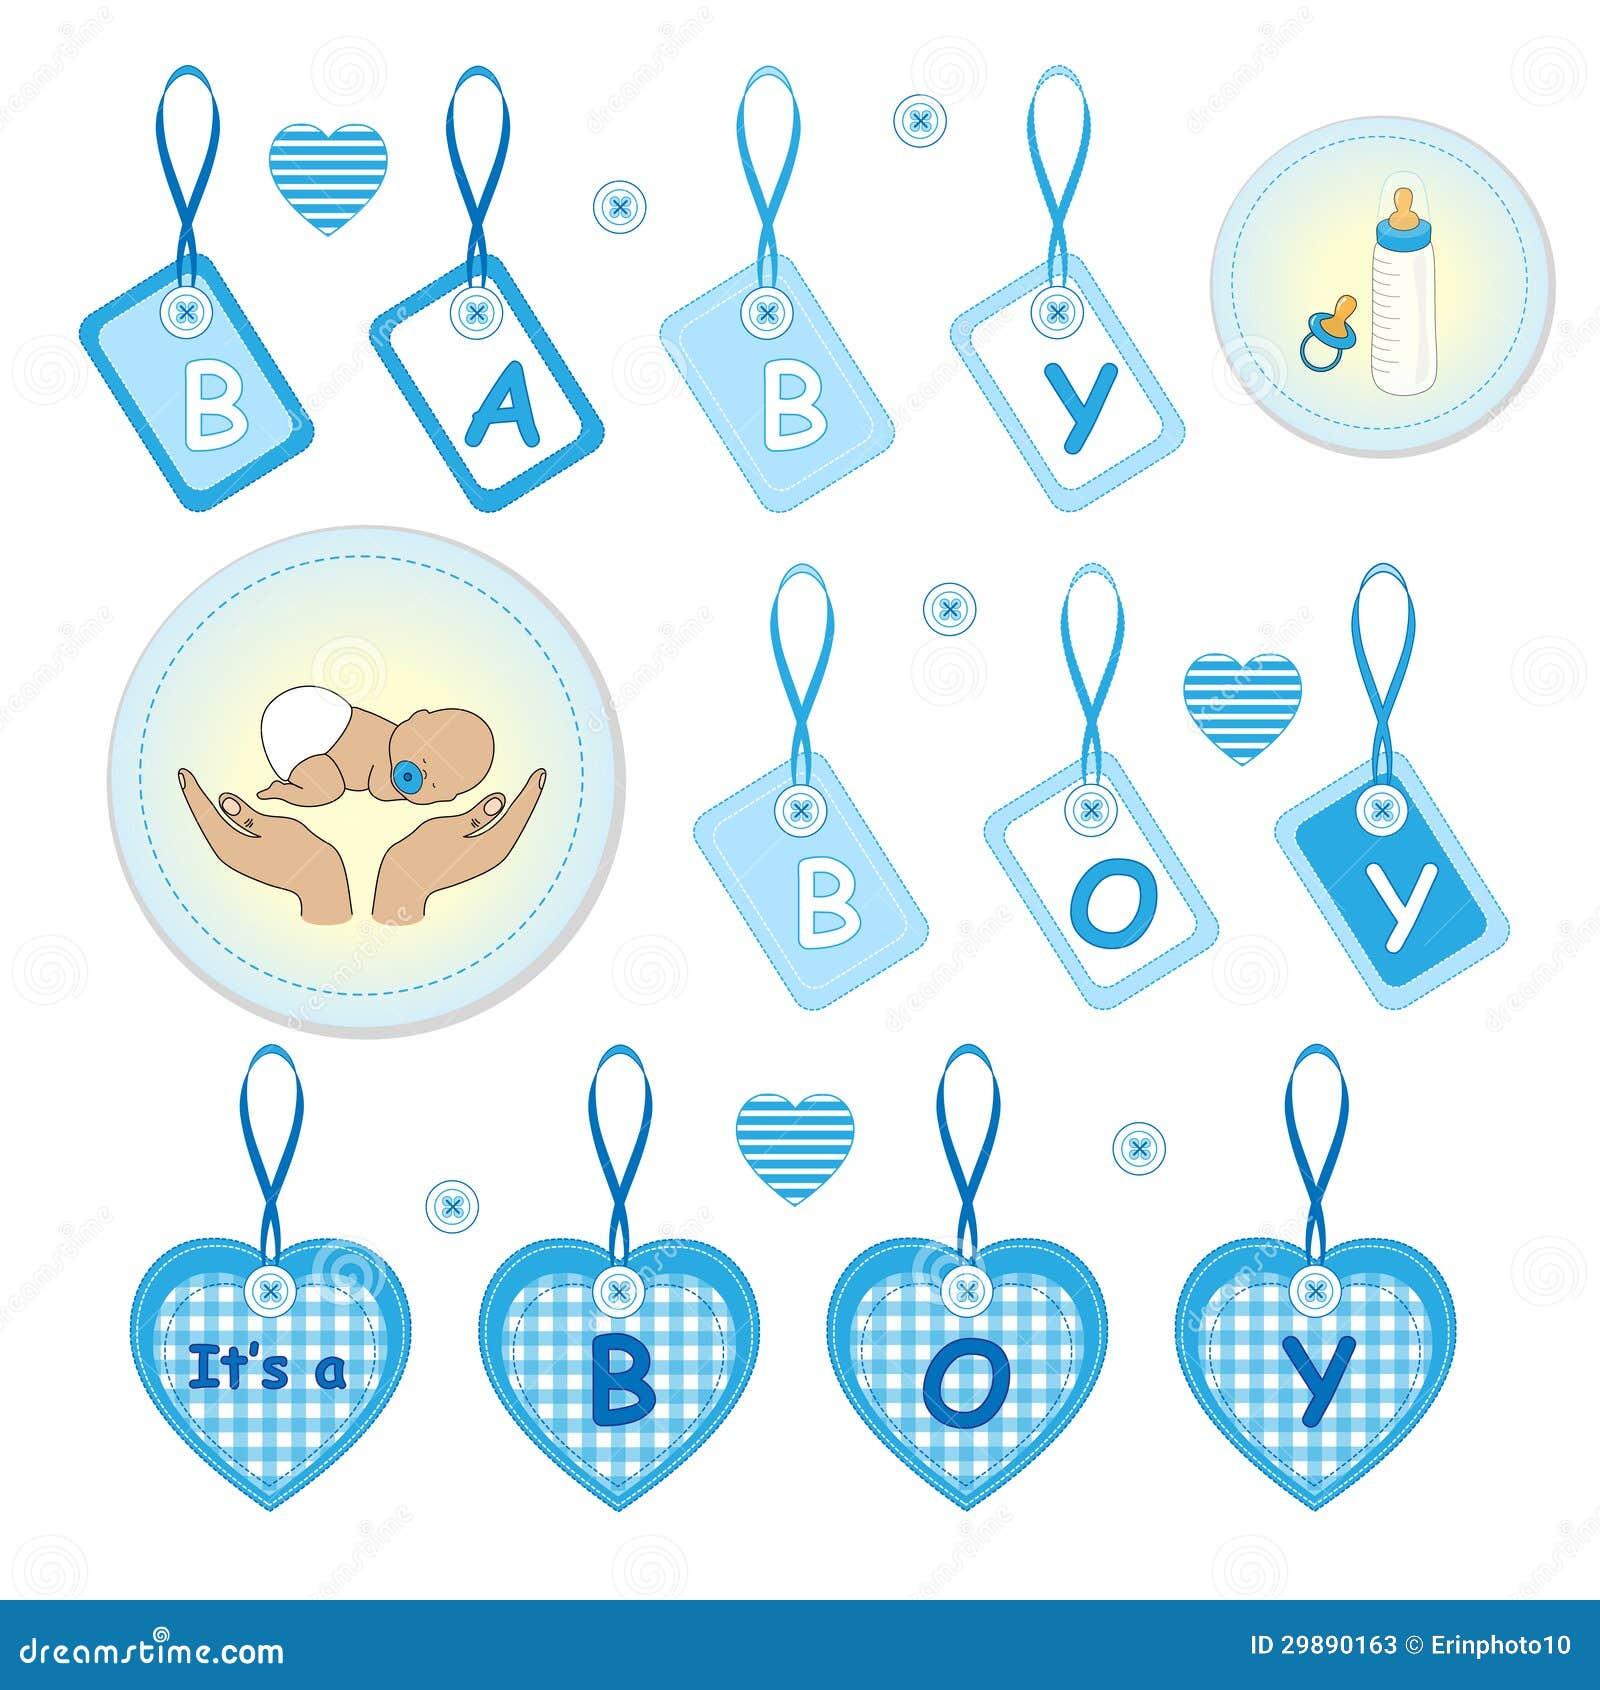 Newborn Baby Boy Design Elements Stock Vector - Image ...